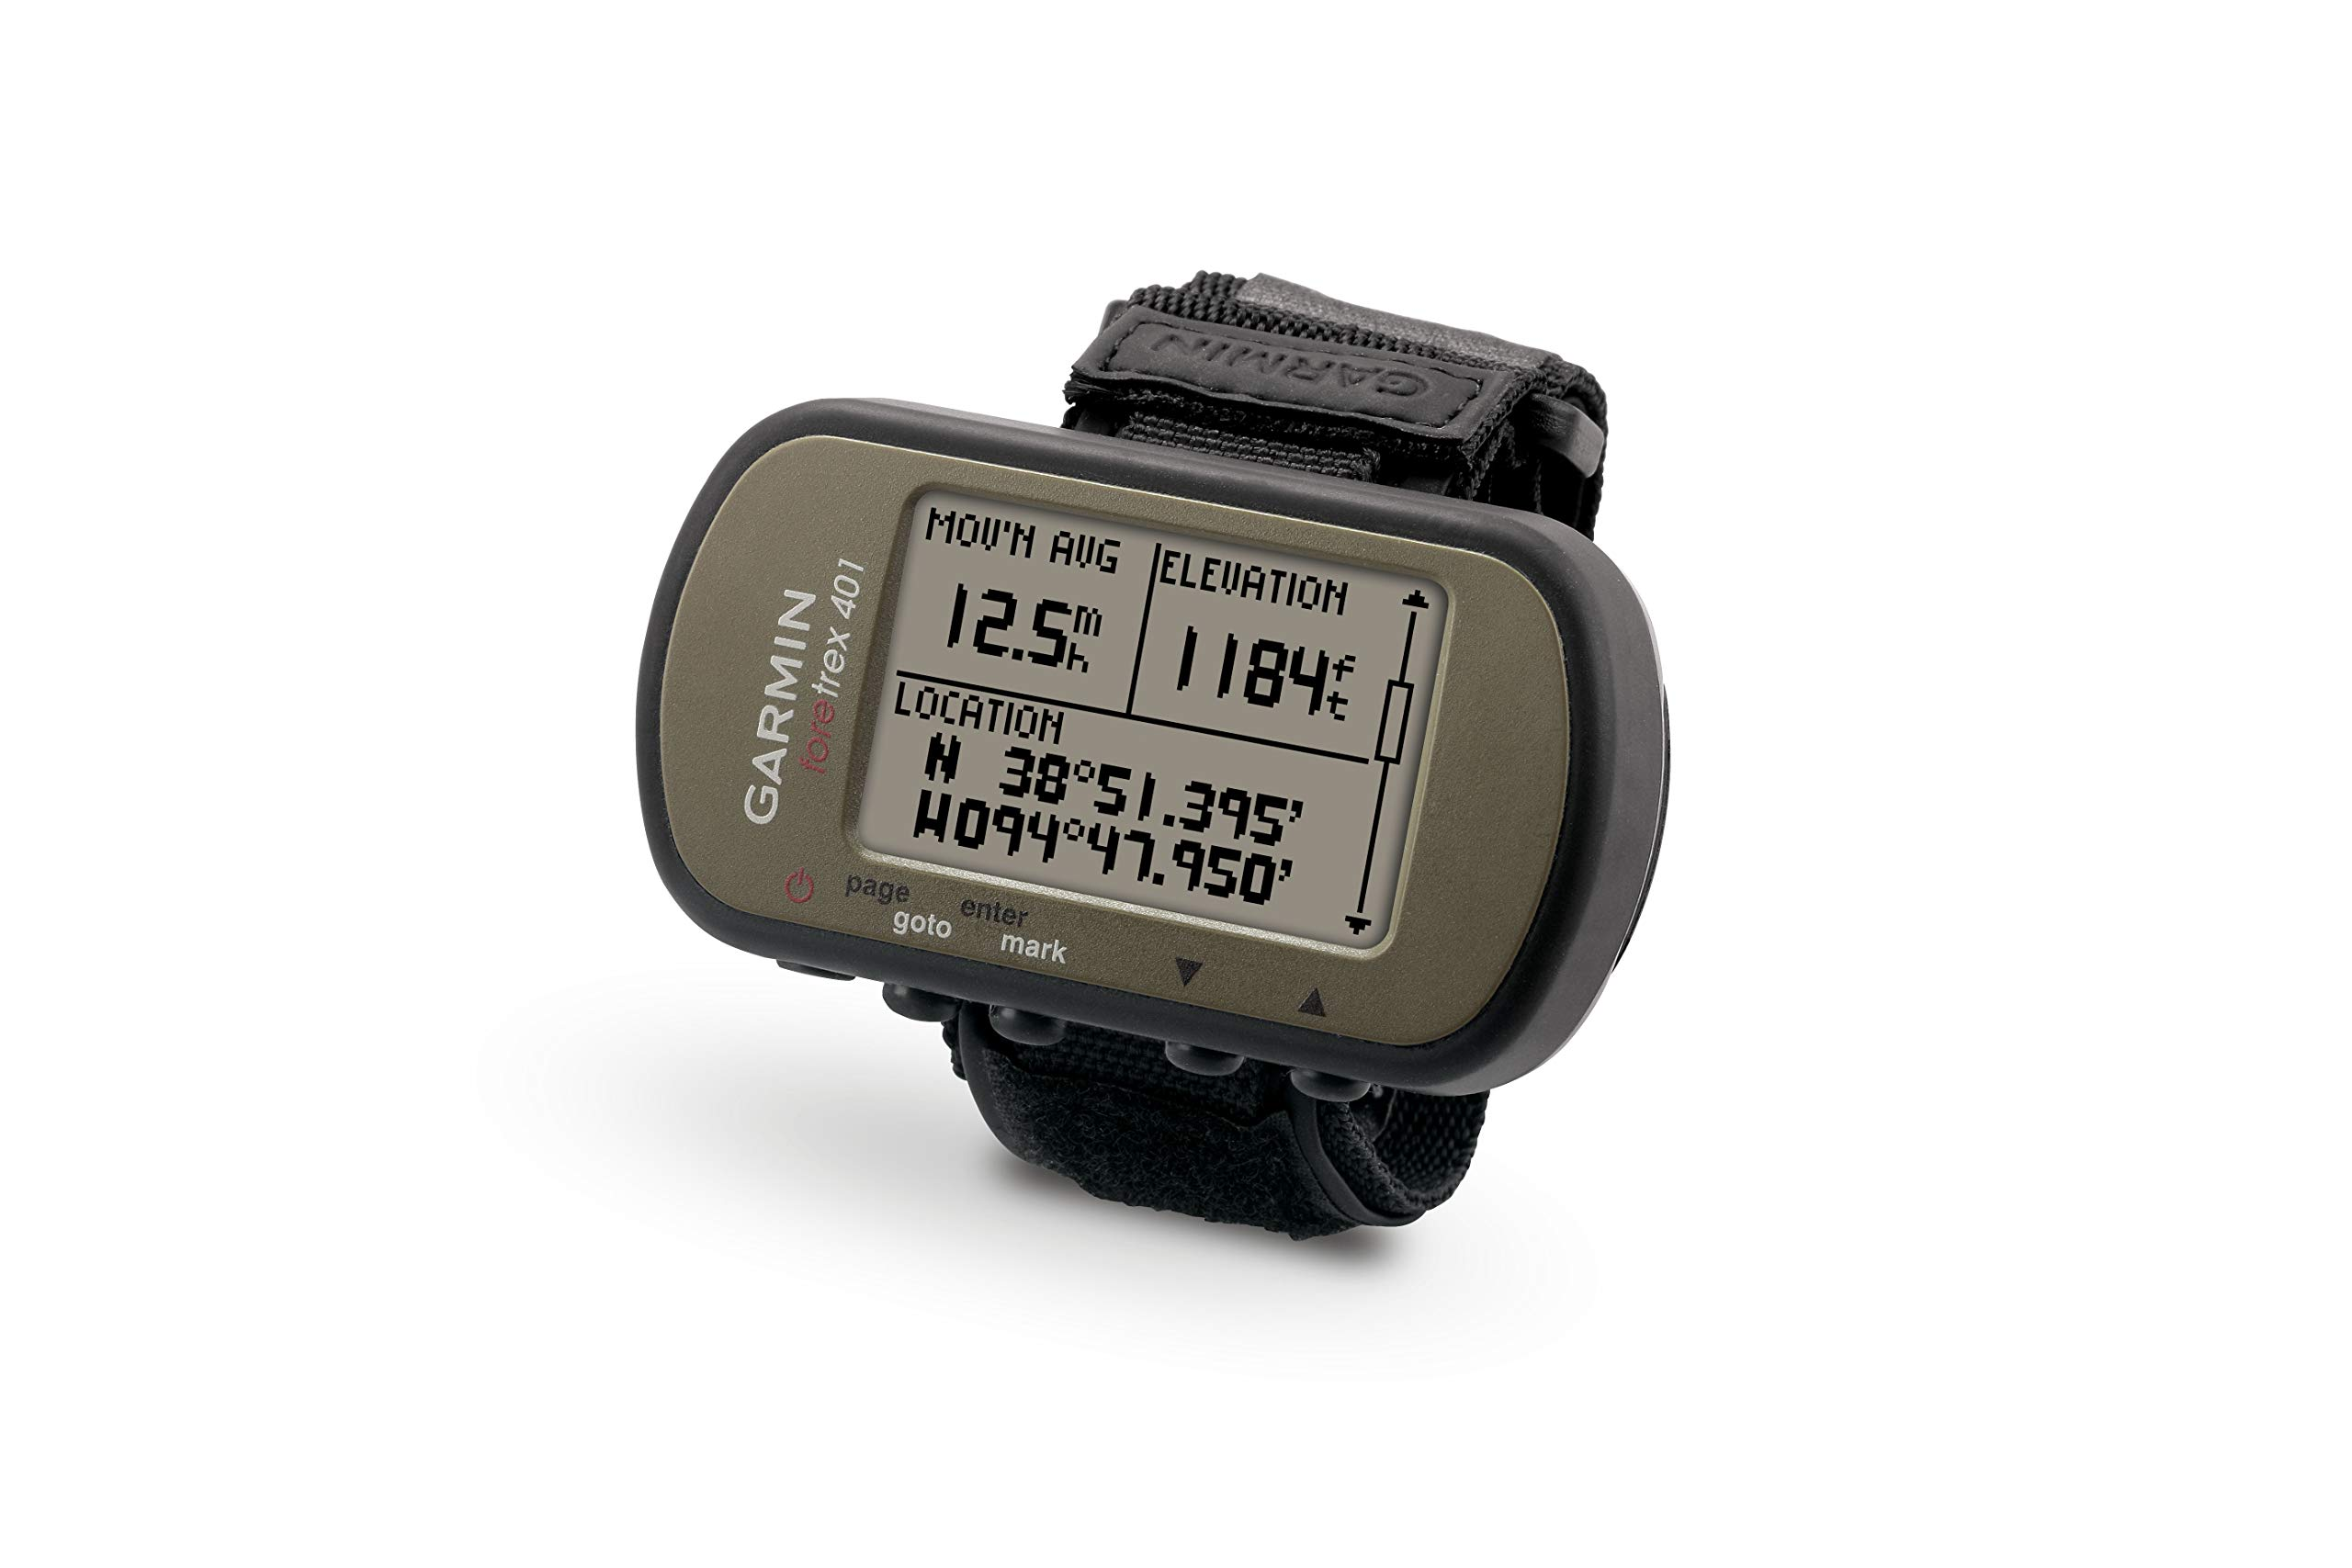 Garmin Foretrex 401 Waterproof Hiking